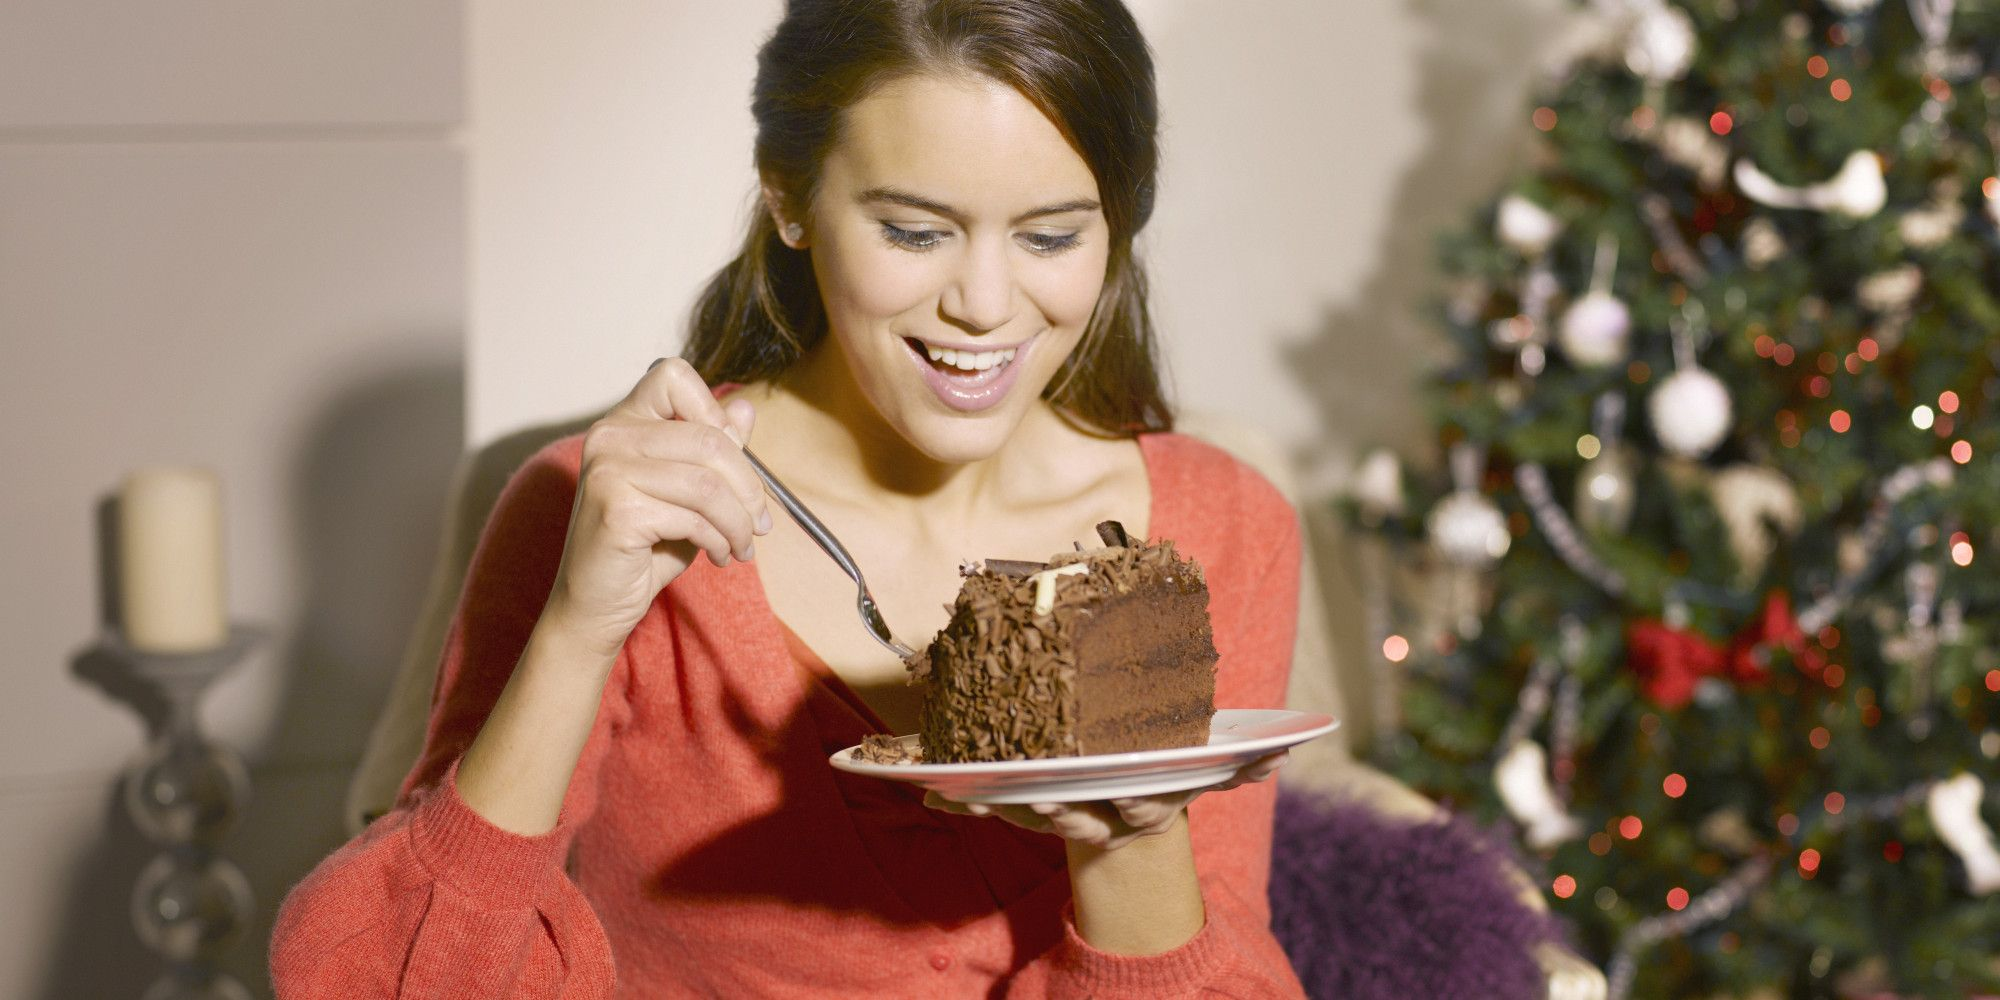 10 rimedi naturali per aiutare la digestione